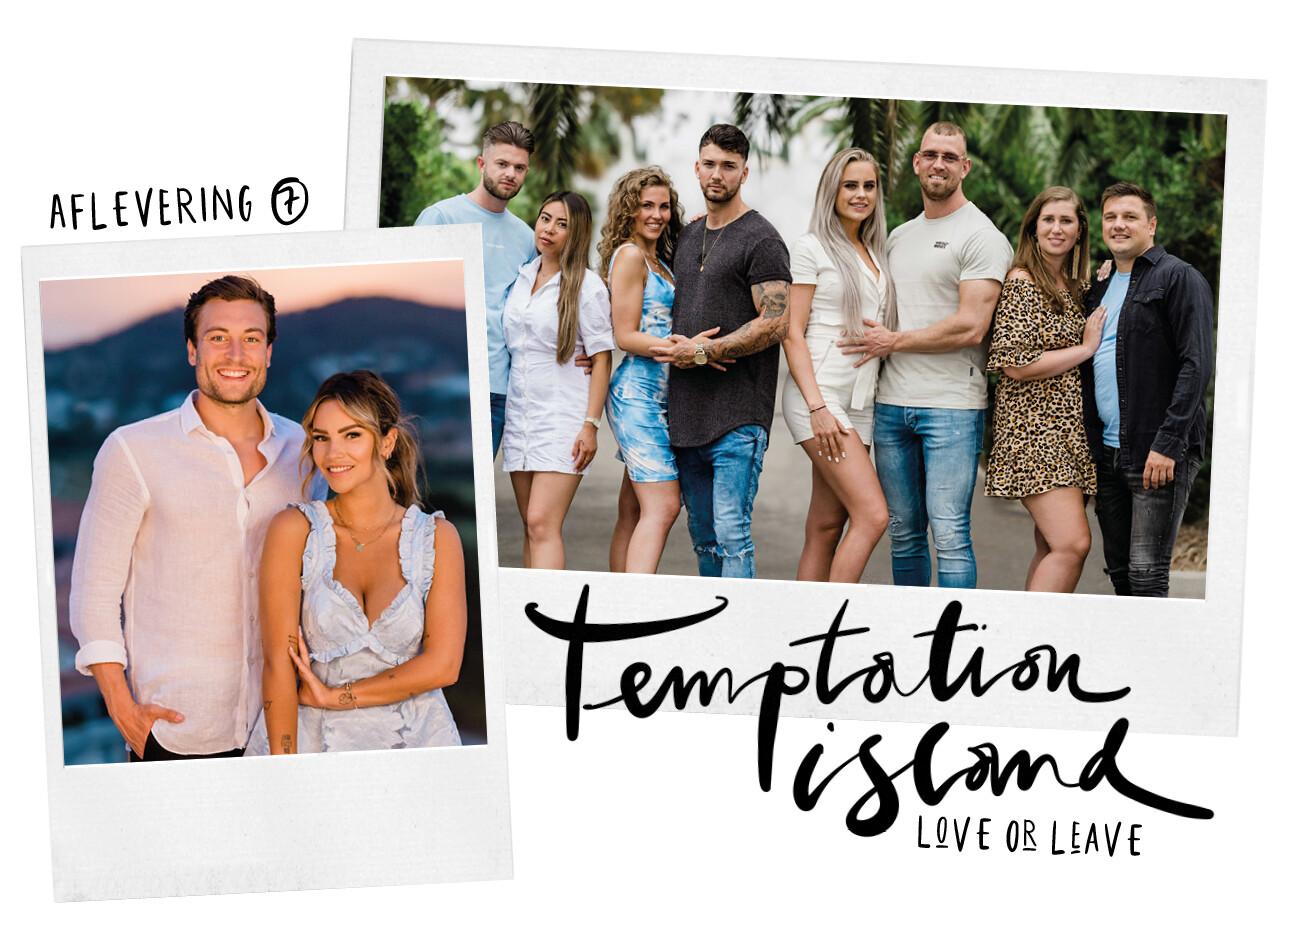 temptation island de napraat aflevering 7